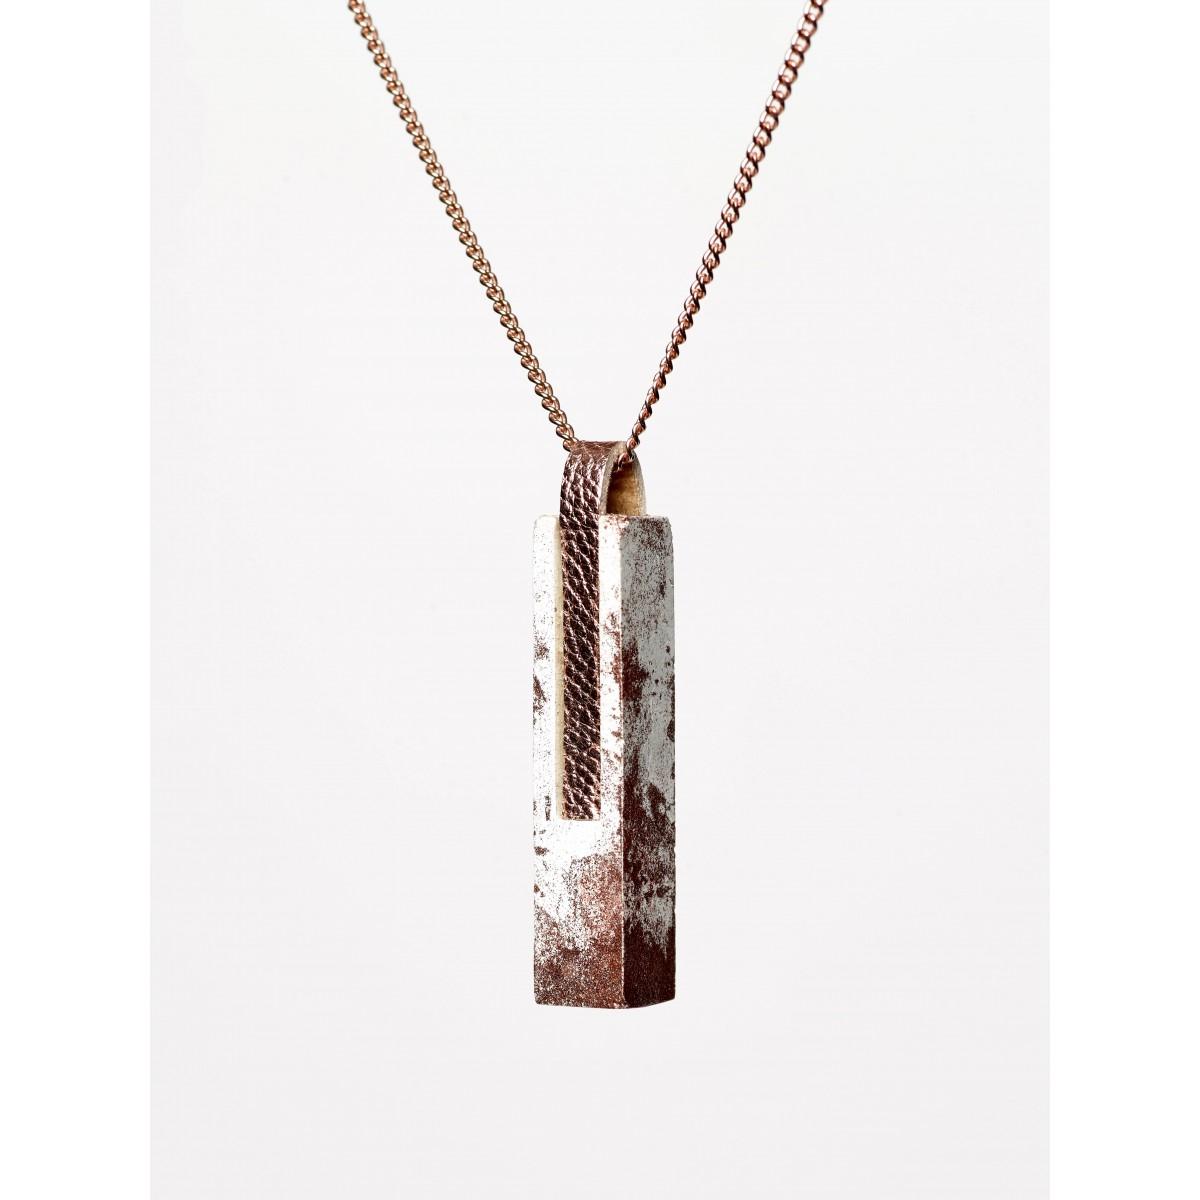 [GS02] Beton Halskette Kette - 925 Silber ROSÉ